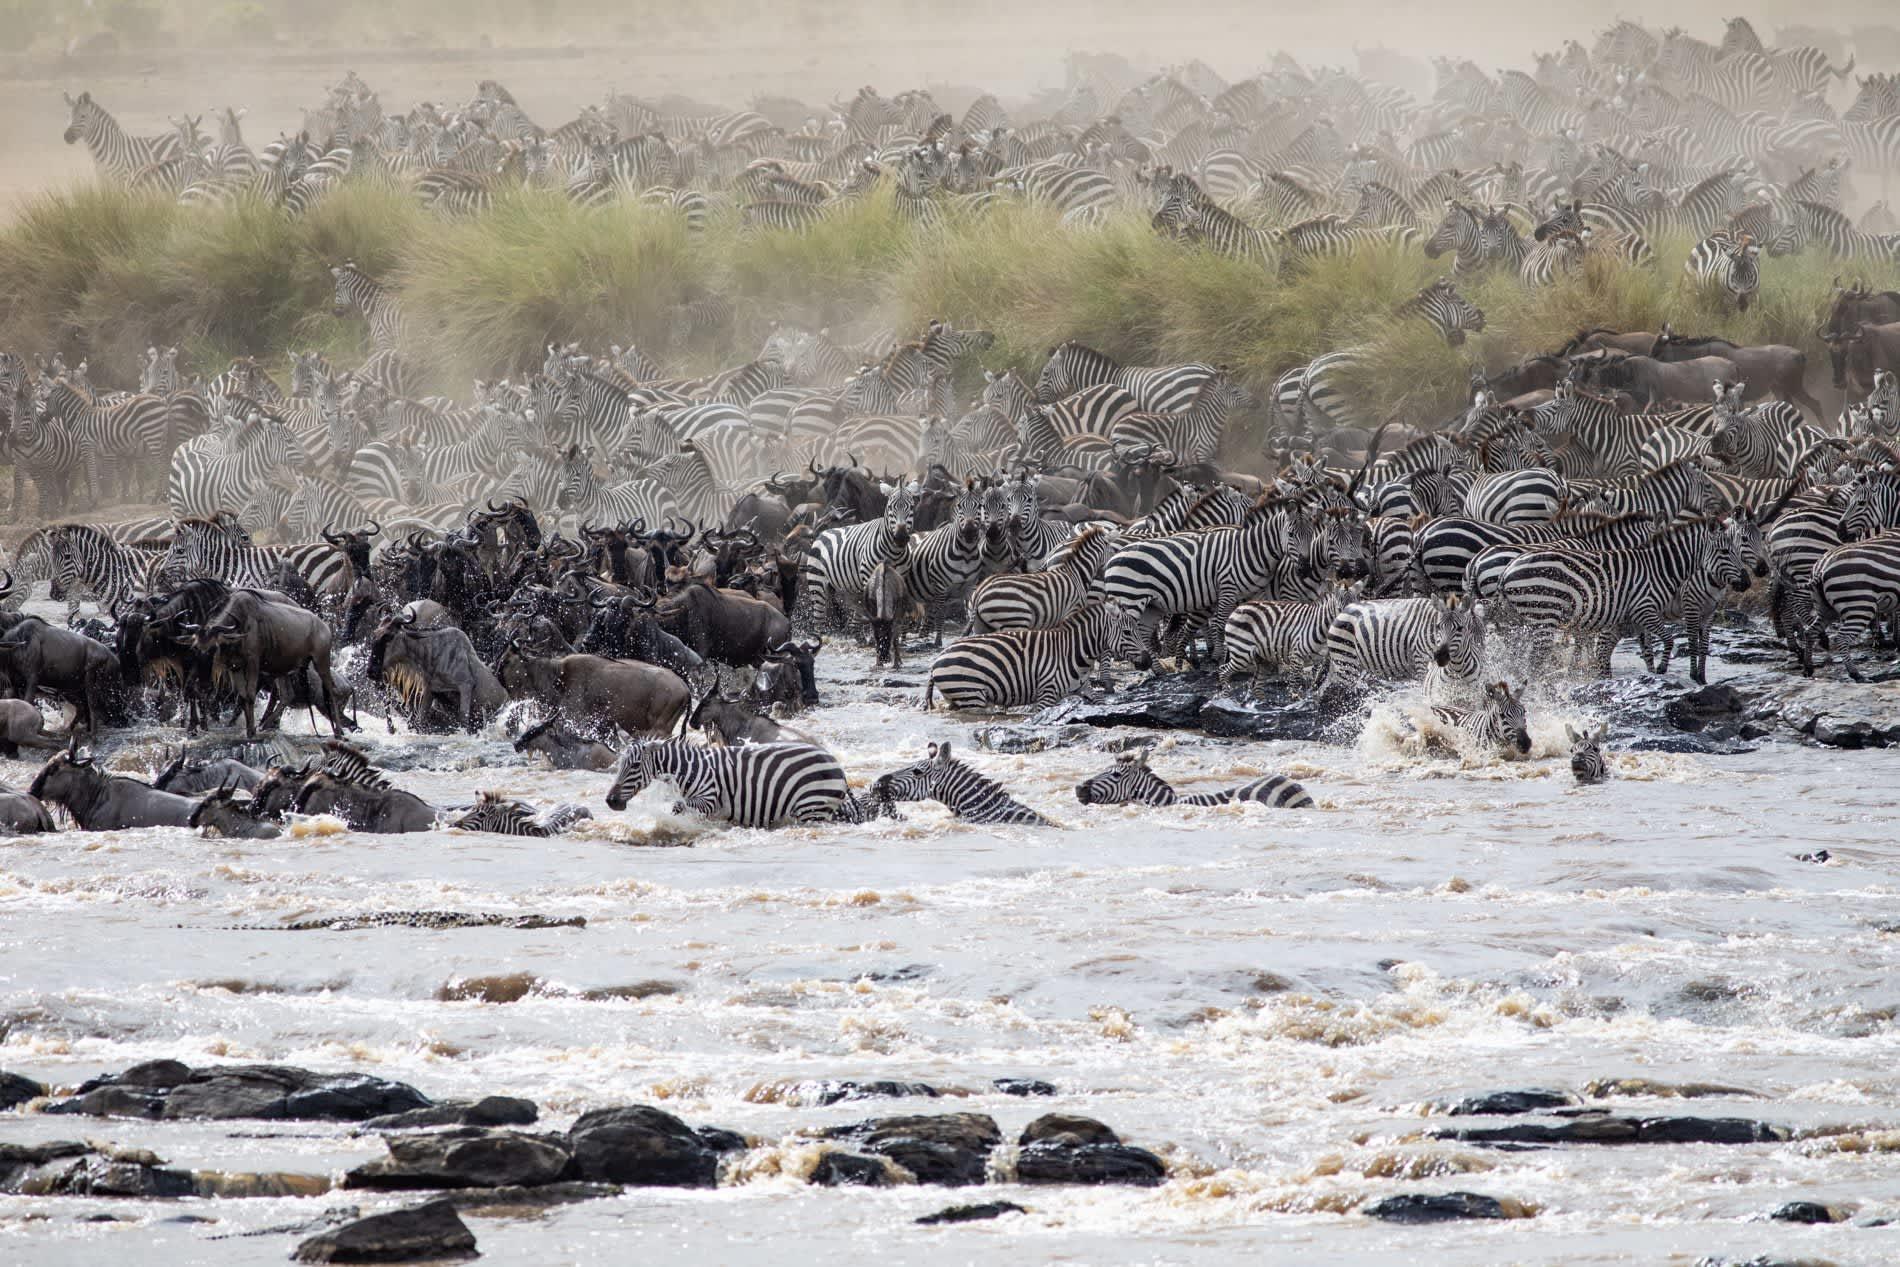 Crossing of the Mara River